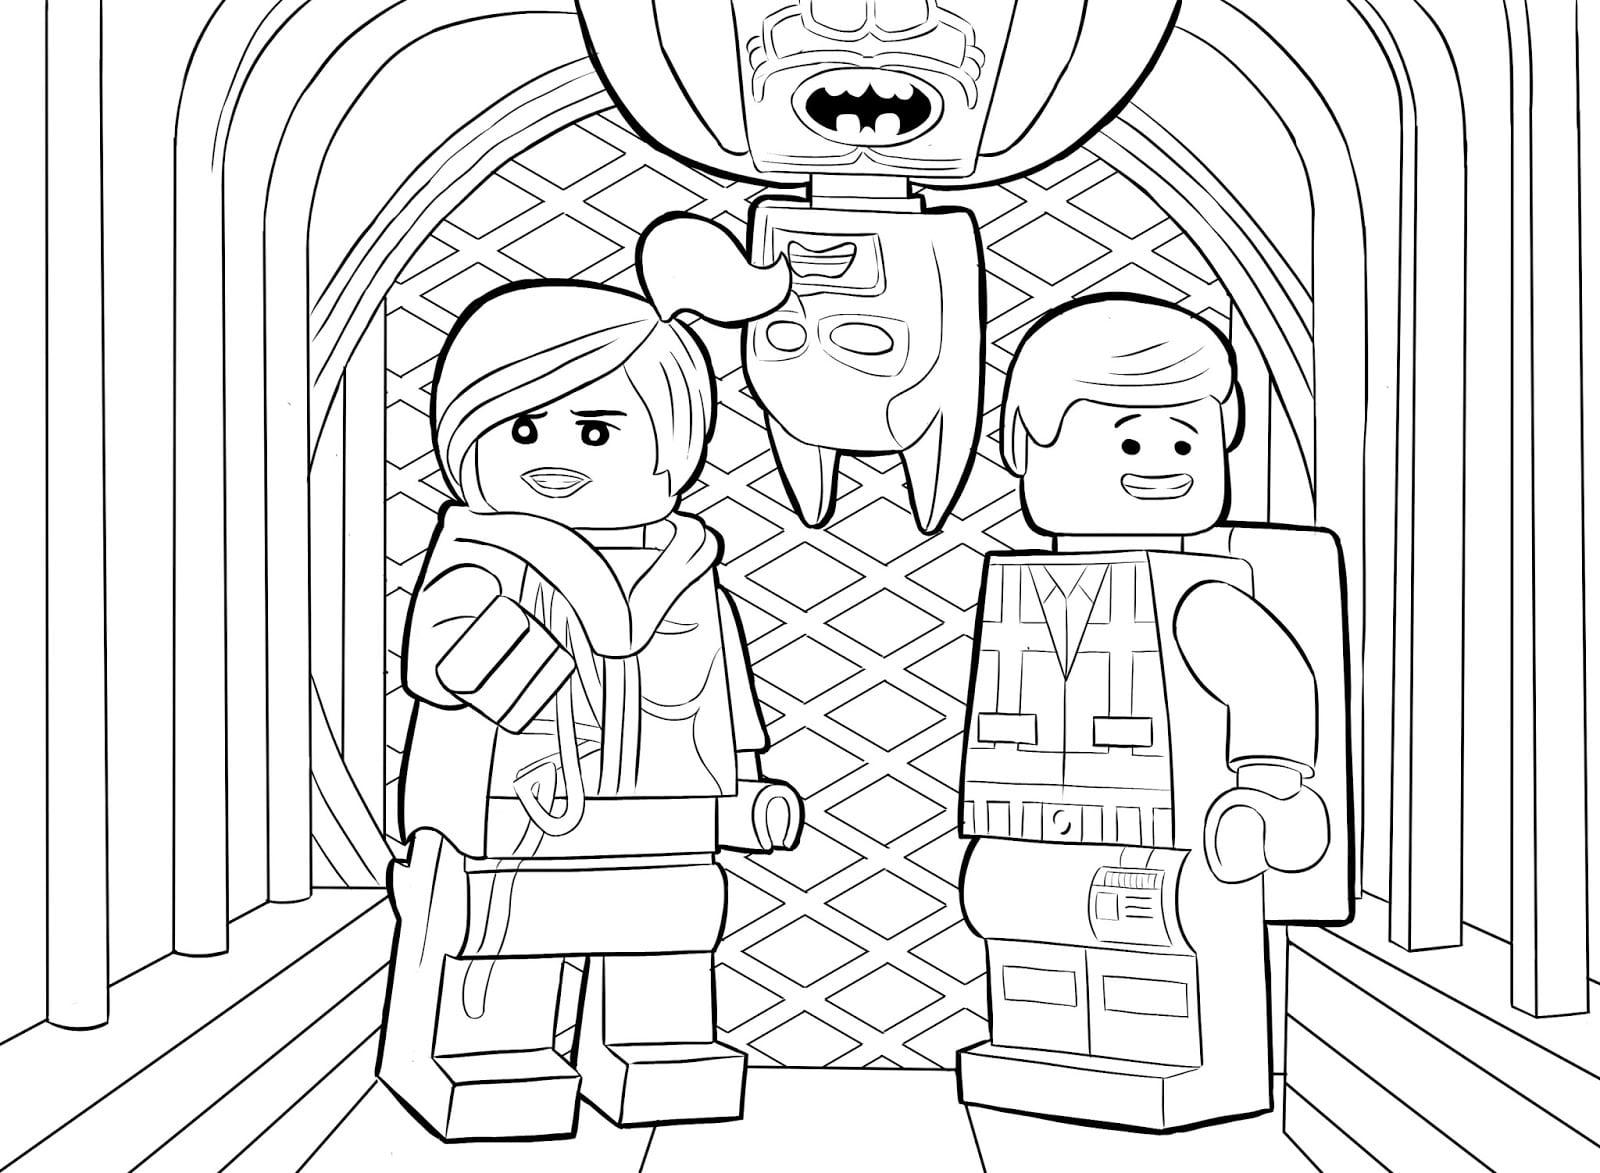 Desenhos Para Colorir Lego Batman 2